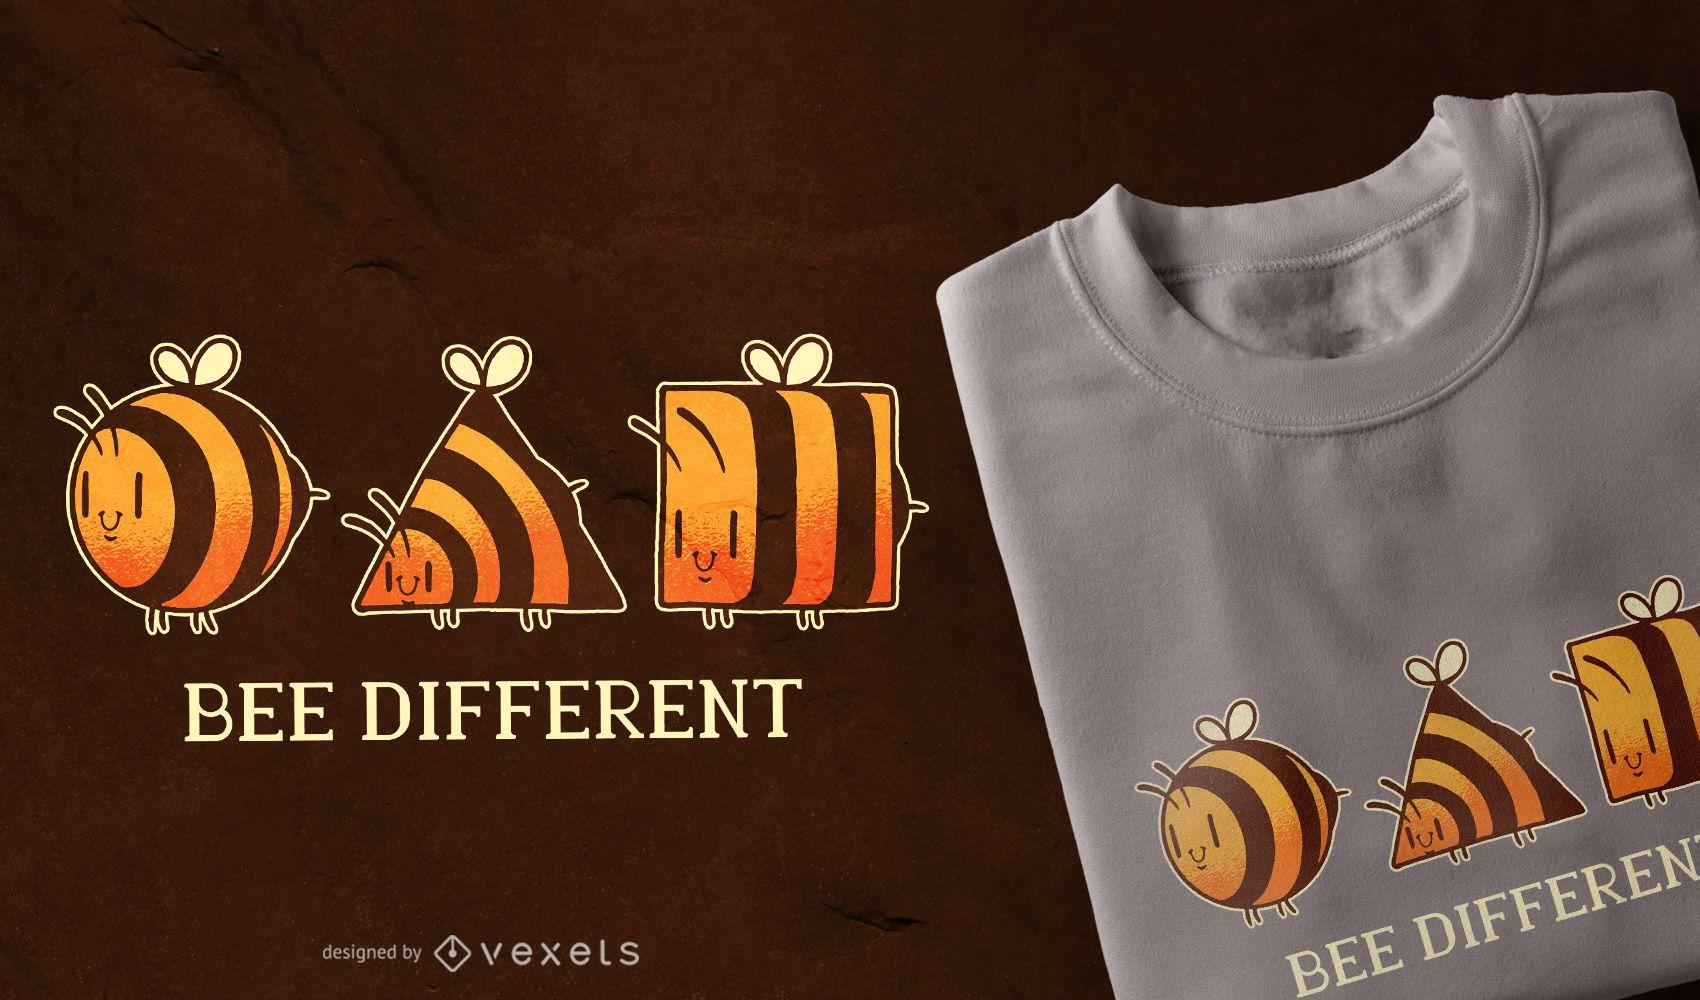 Bee different t-shirt design